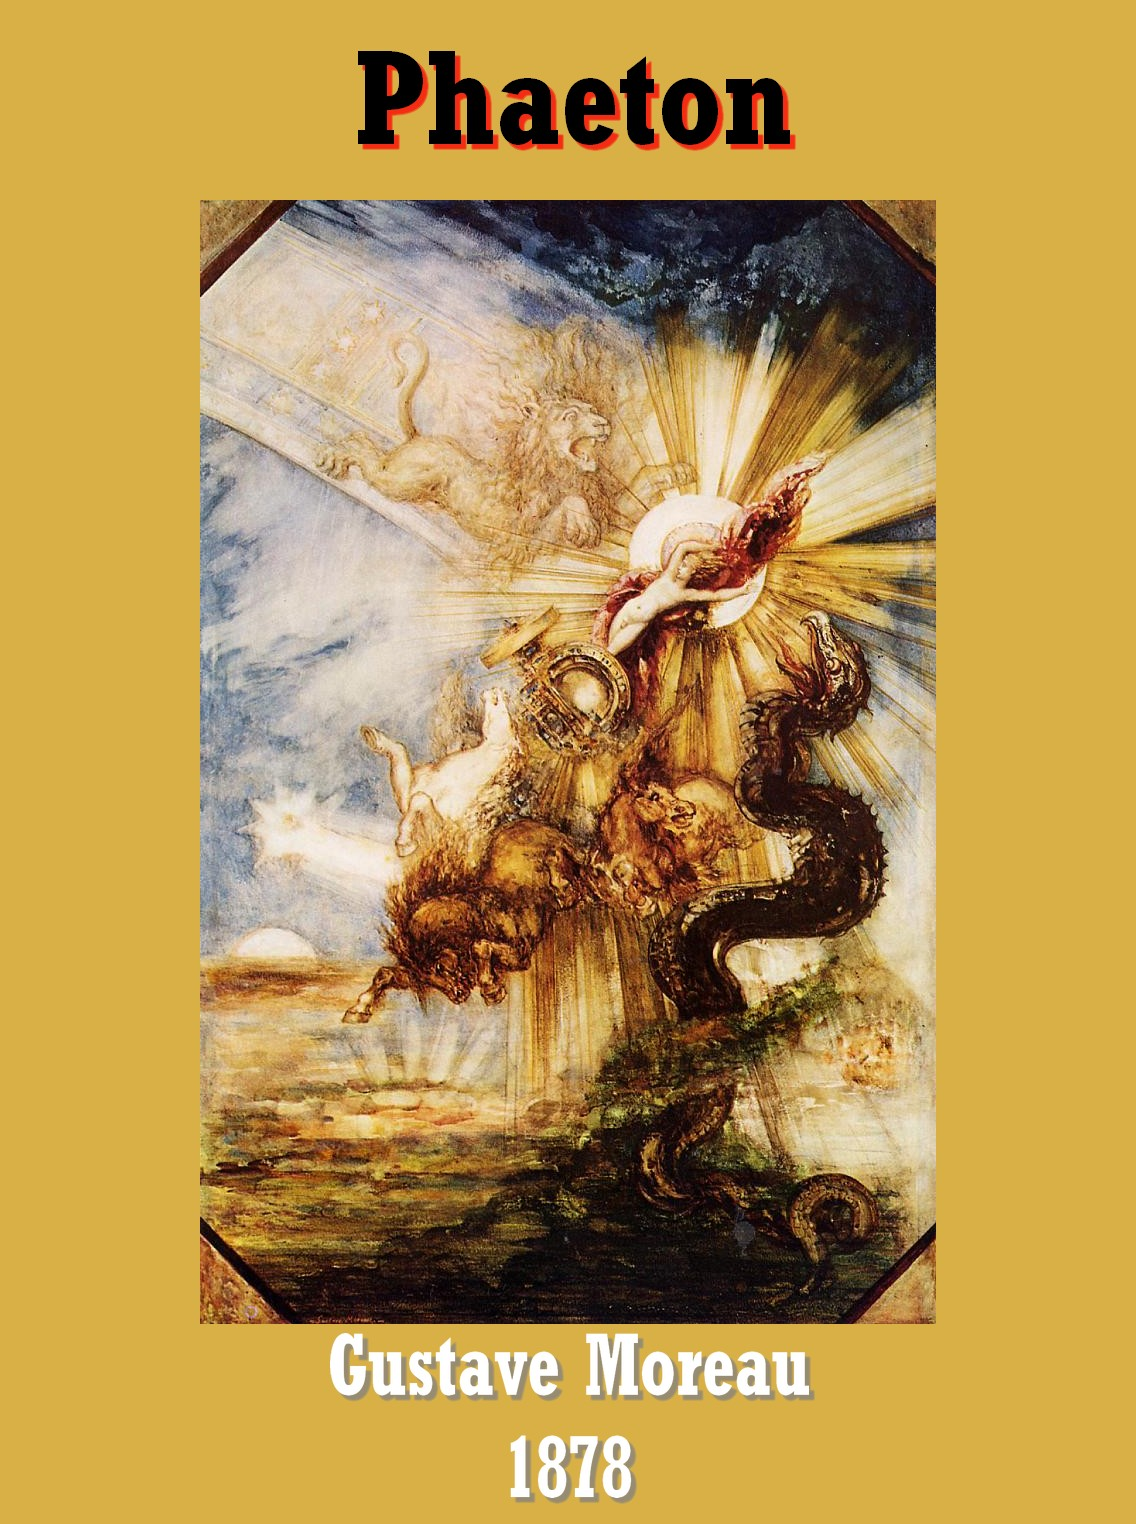 Suetone Caligula Gustave_Moreau_-_Phaeton,_1878